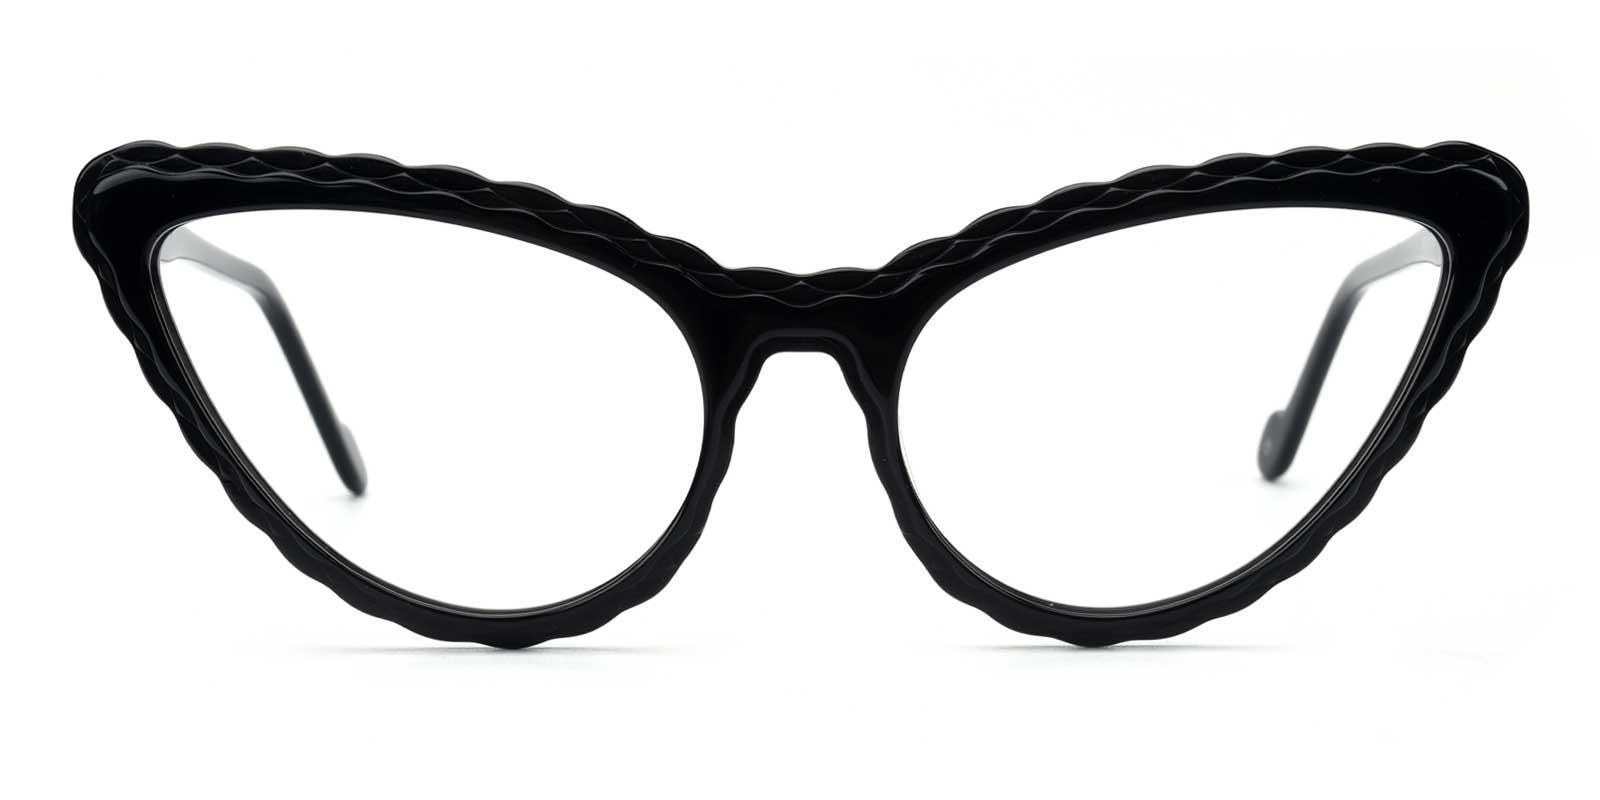 Barry-Black-Cat-Acetate-Eyeglasses-detail